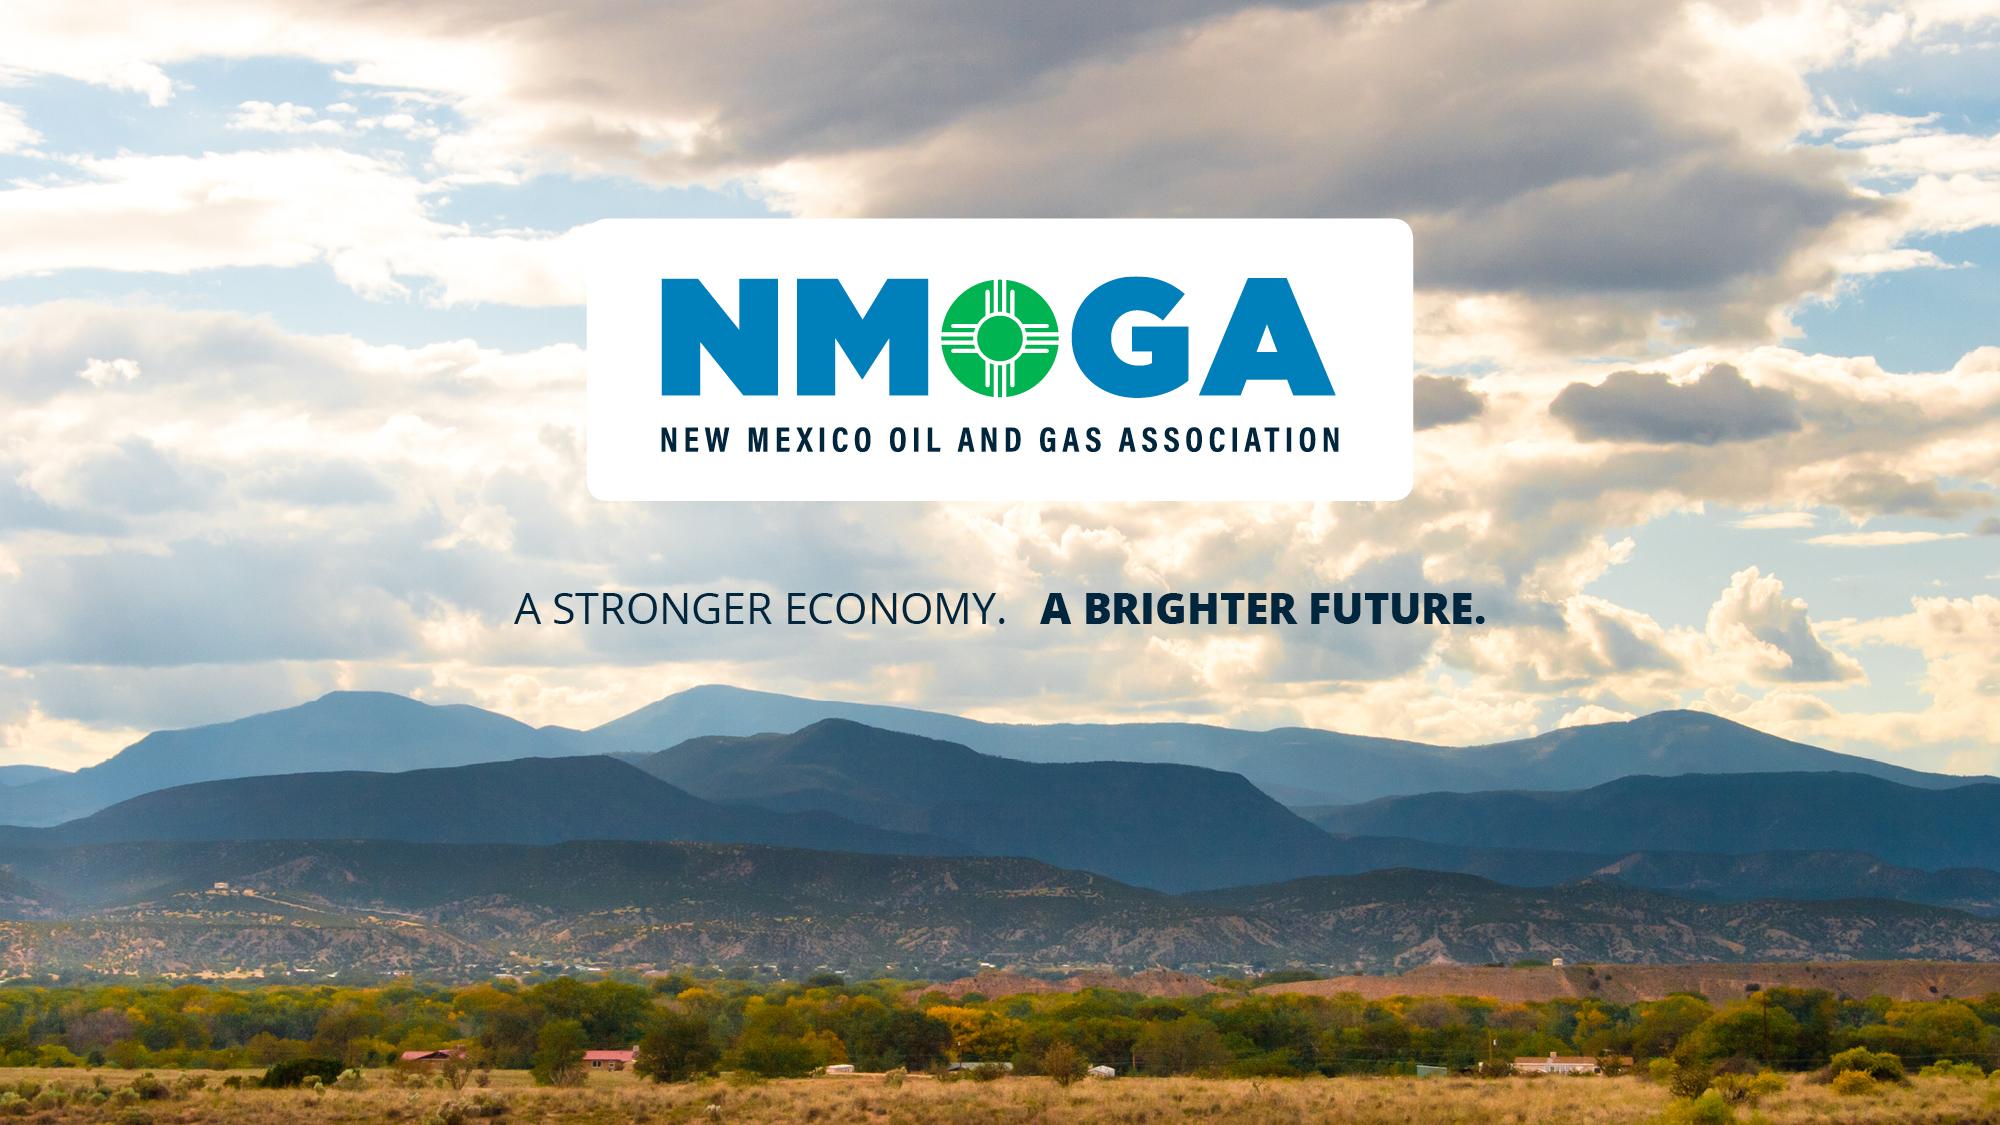 New Mexico Oil & Gas Association – The Waite Company